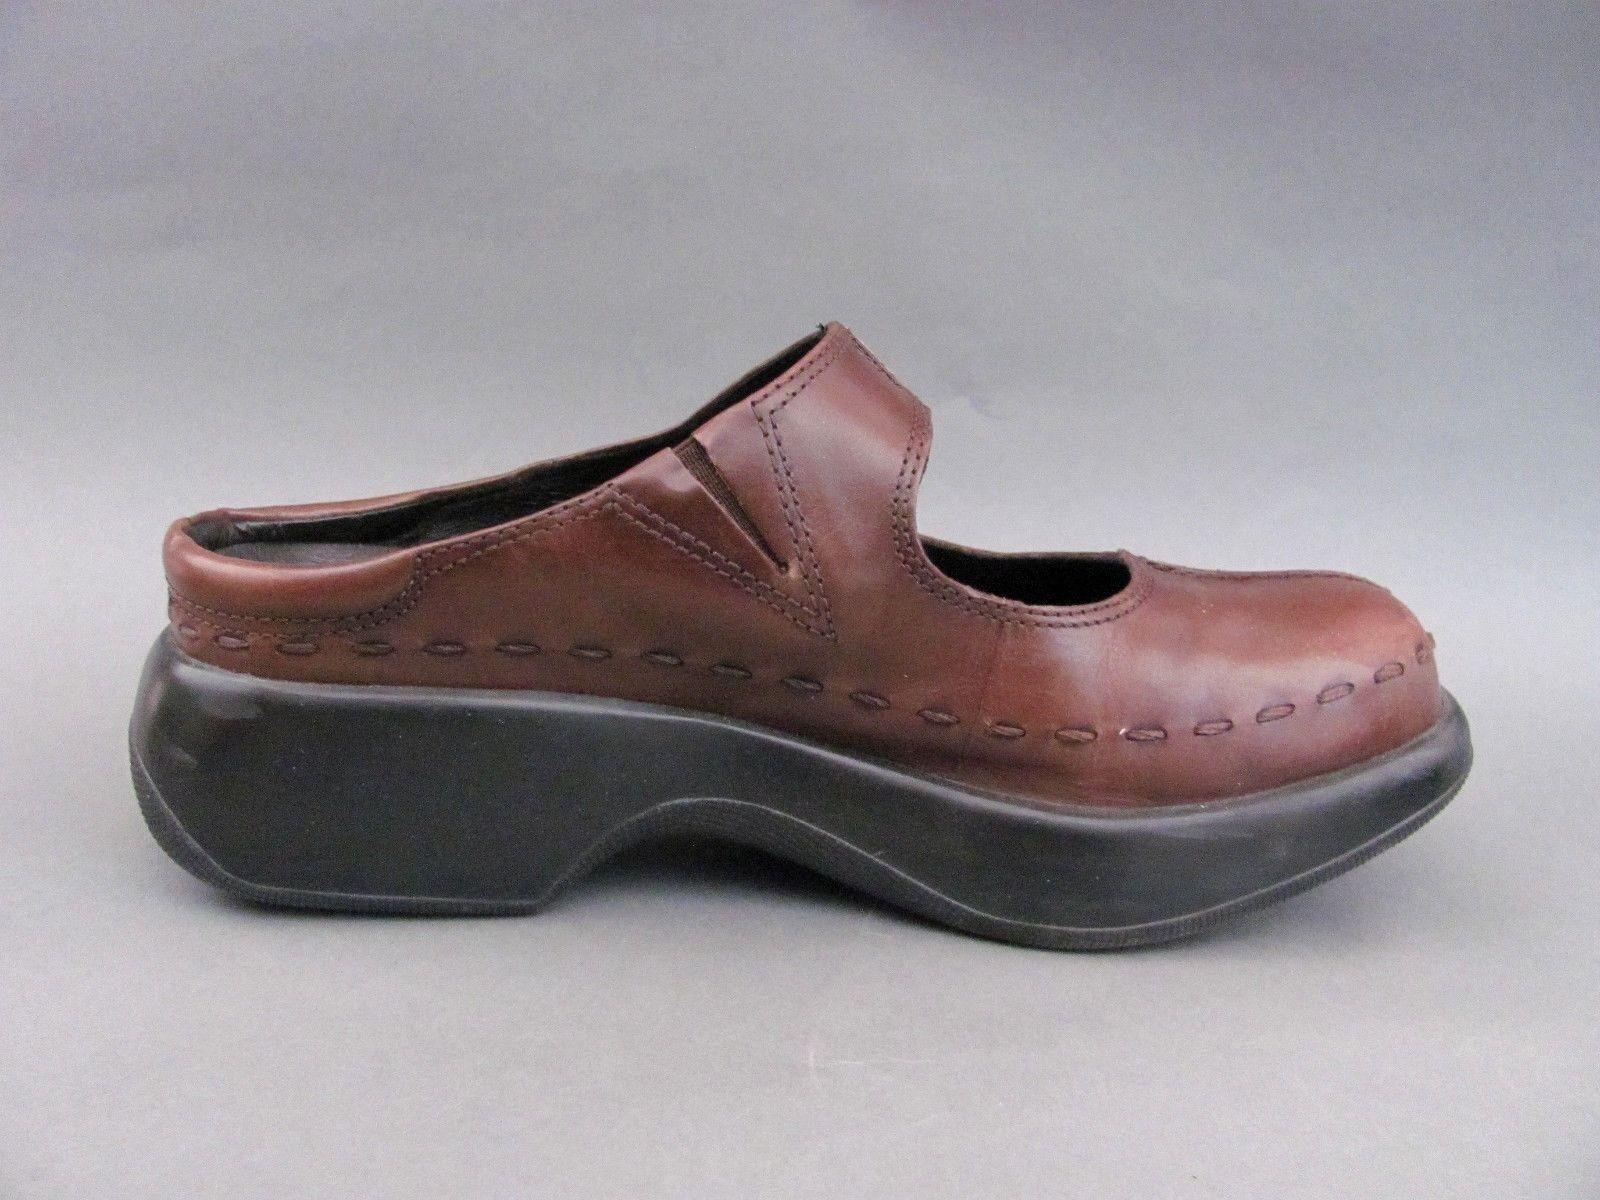 DANSKO Brown Leather Mary Jane Clogs Slip 9, On US 9, Slip EU 40 22f6ee